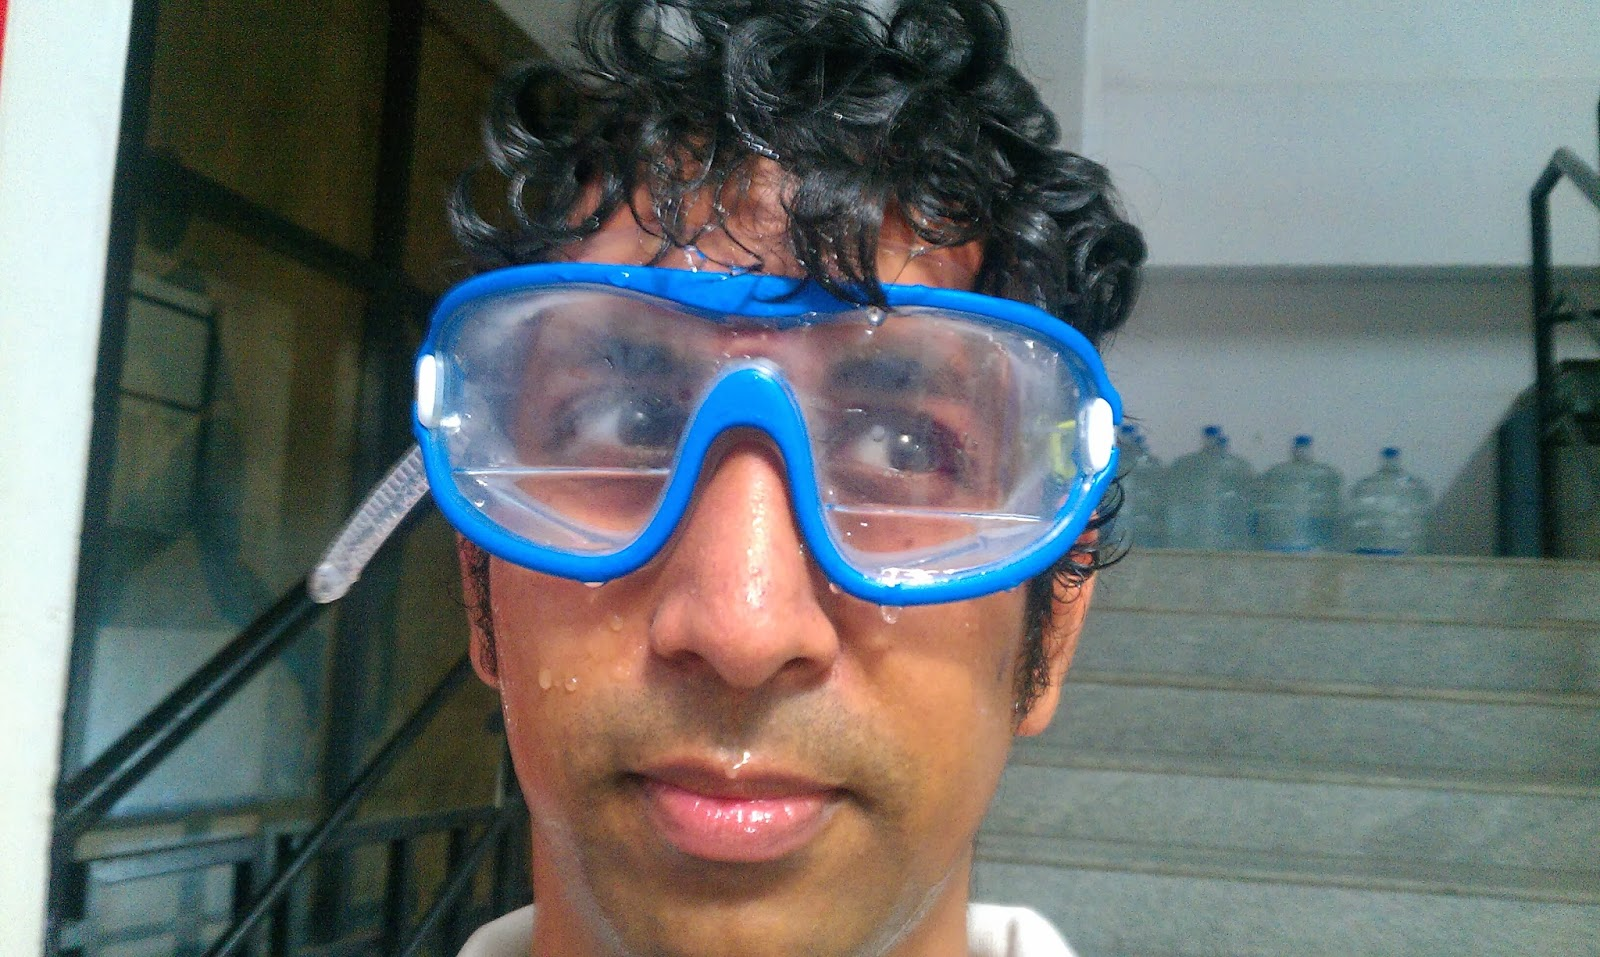 arif s thought decathlon nabaiji swimming goggle and swimming cap